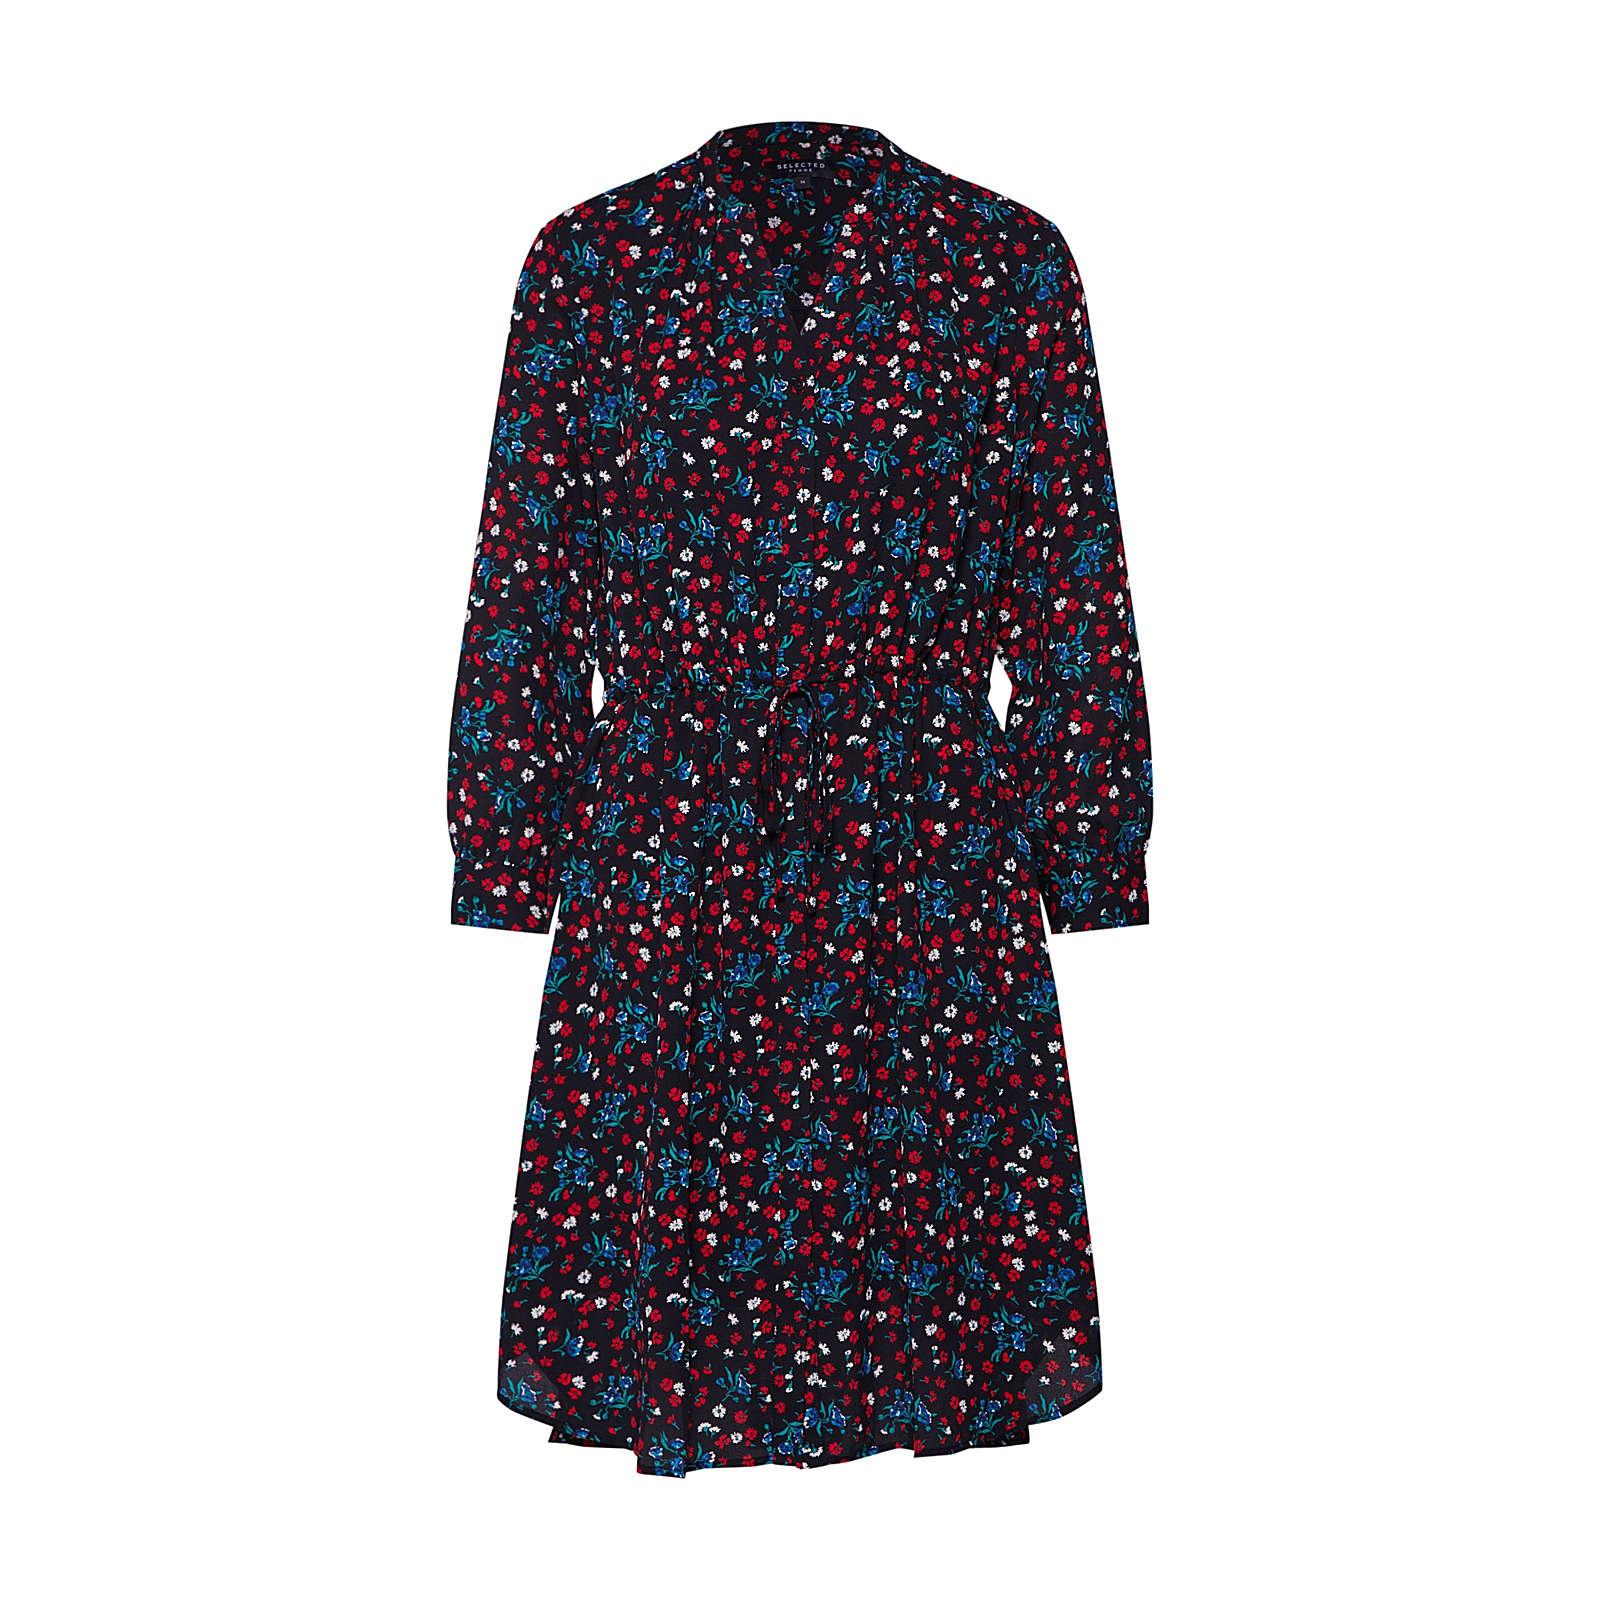 SELECTED FEMME Blusenkleid DAMINA Blusenkleider schwarz Damen Gr. 36